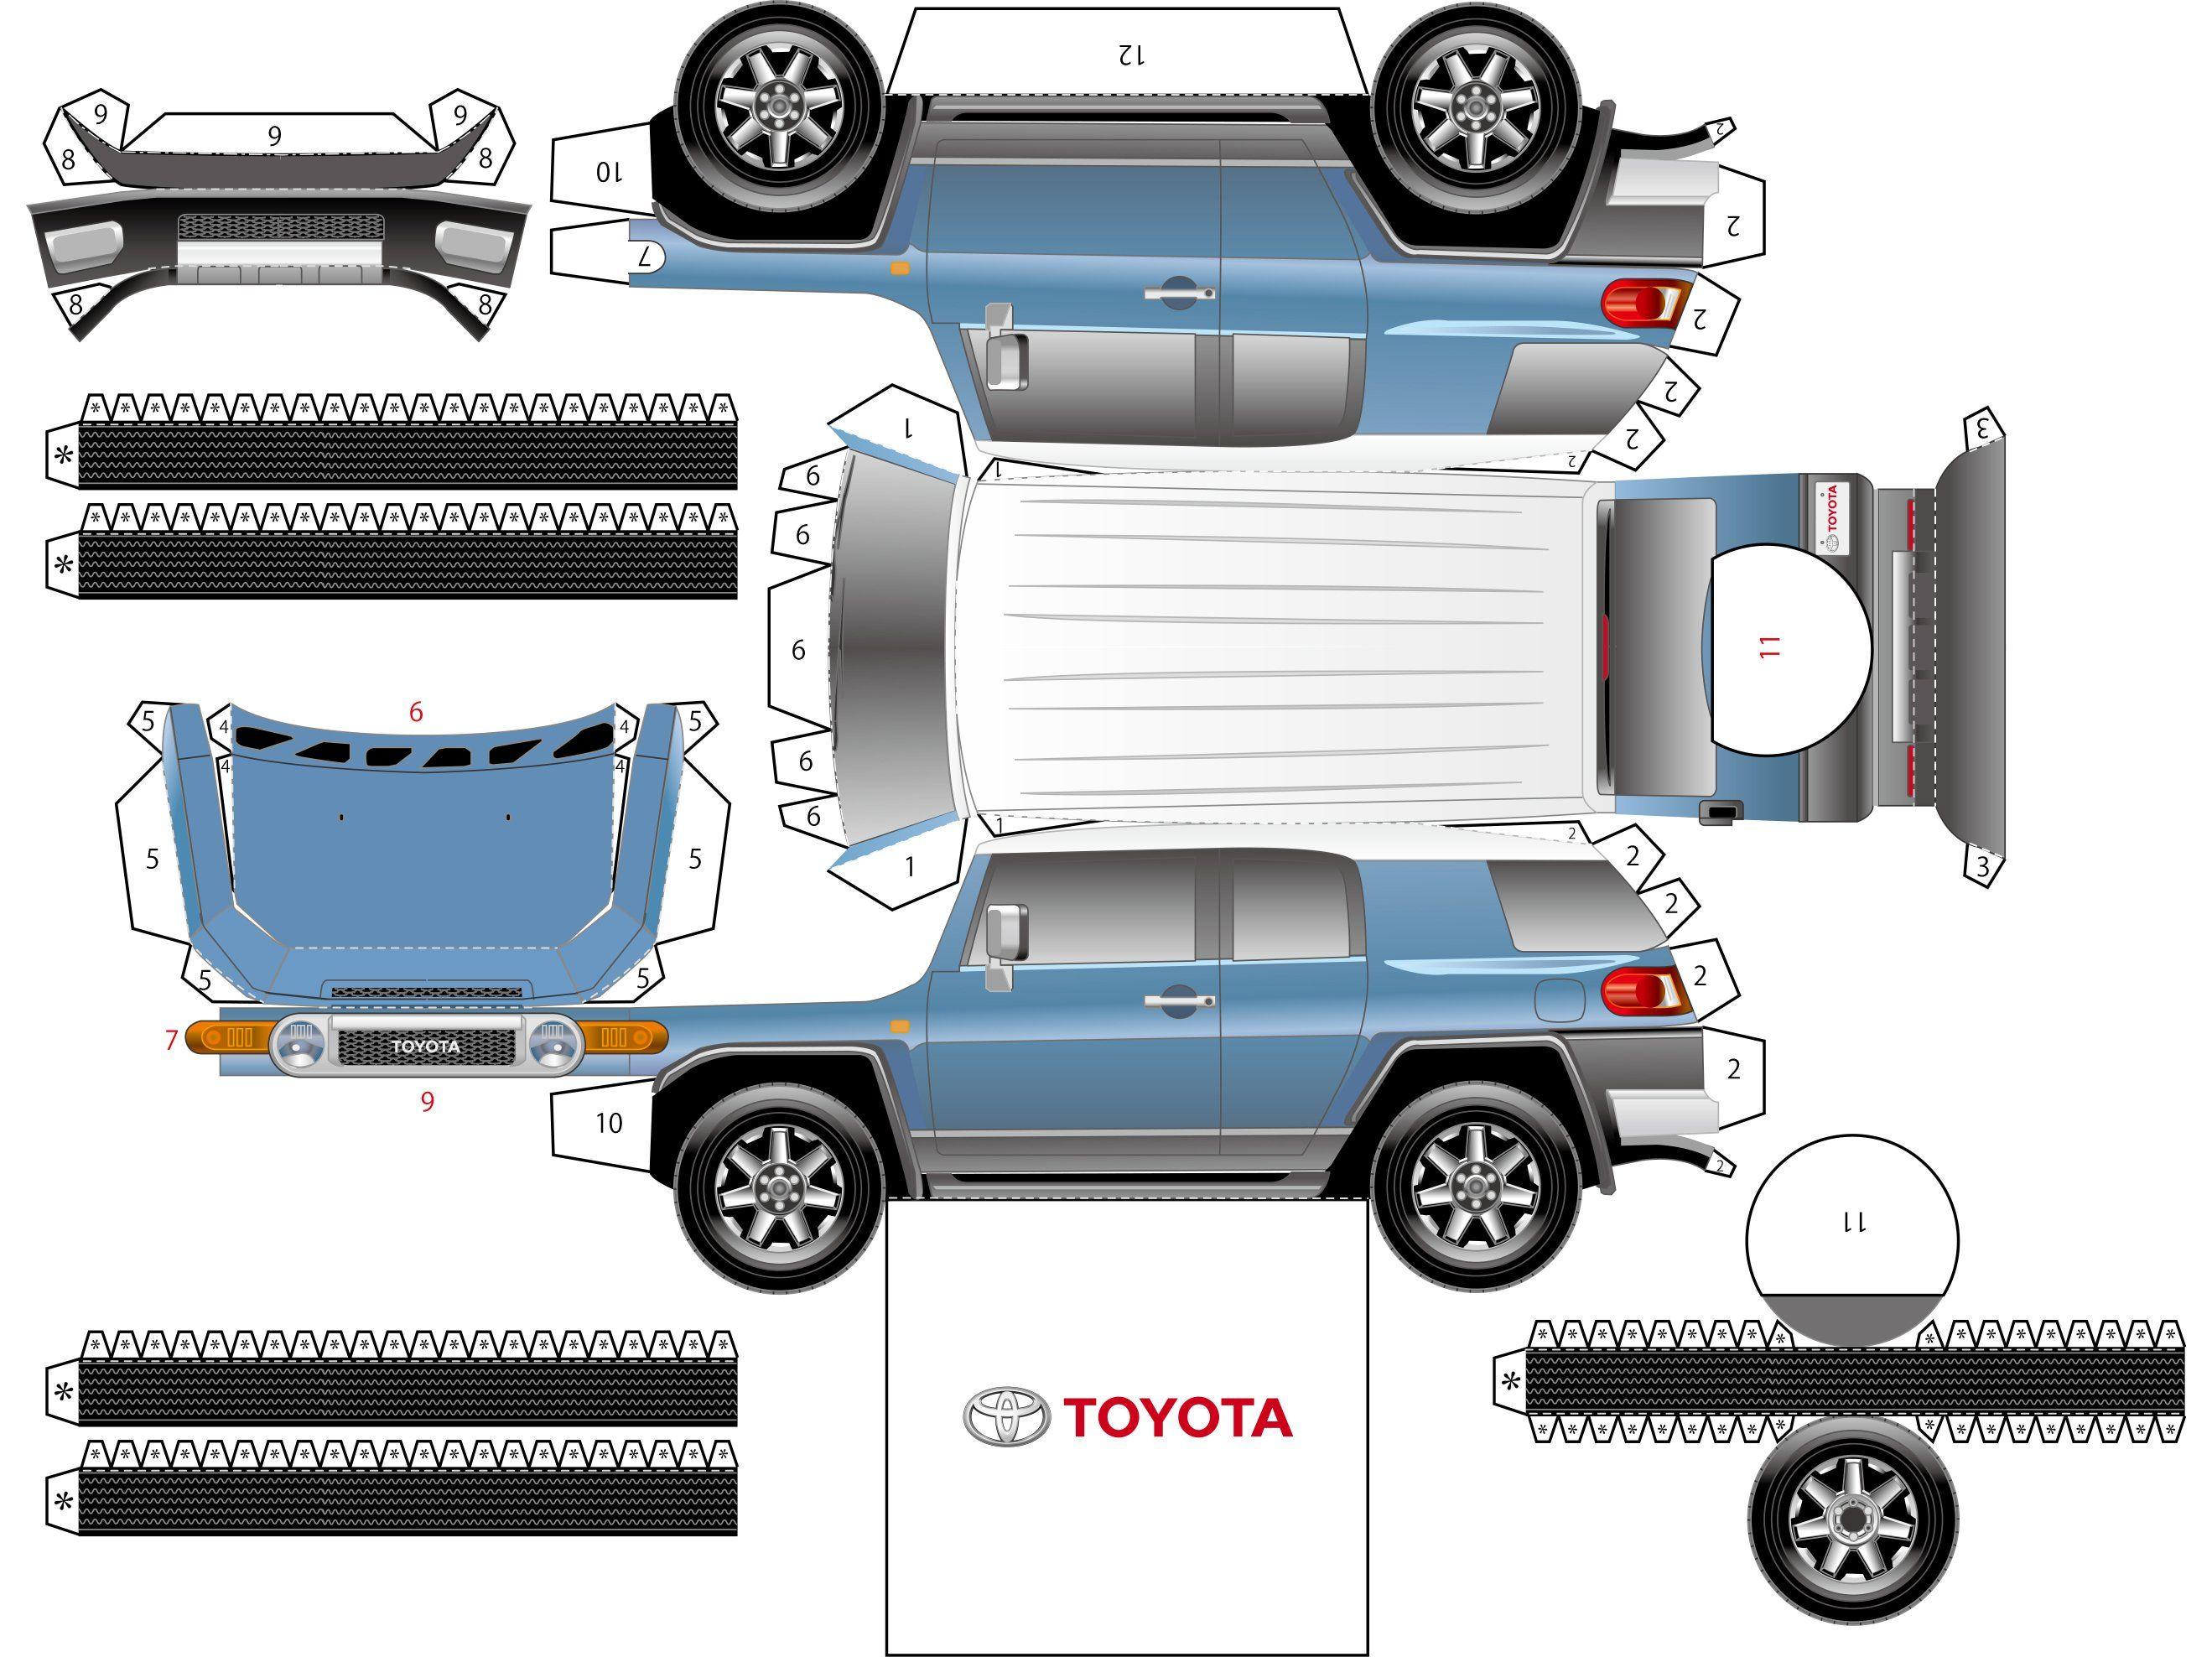 Toyota Fj Cruiser Paper Model Car Paper Models Paper Car